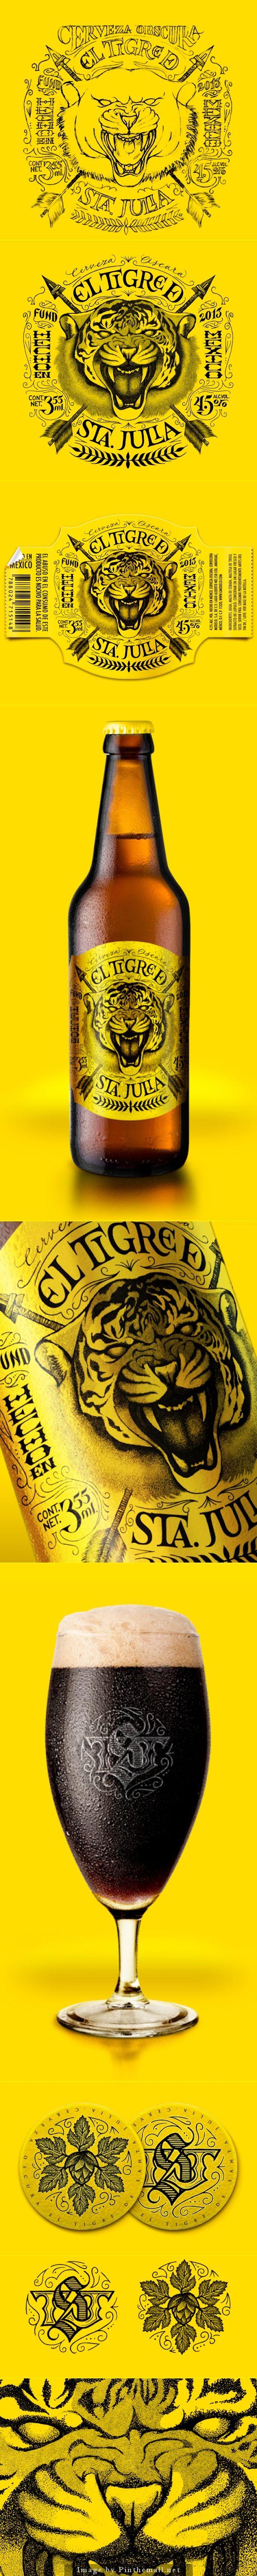 El Tigre de Santa Julia Designer: Christian Antolin Country: United States